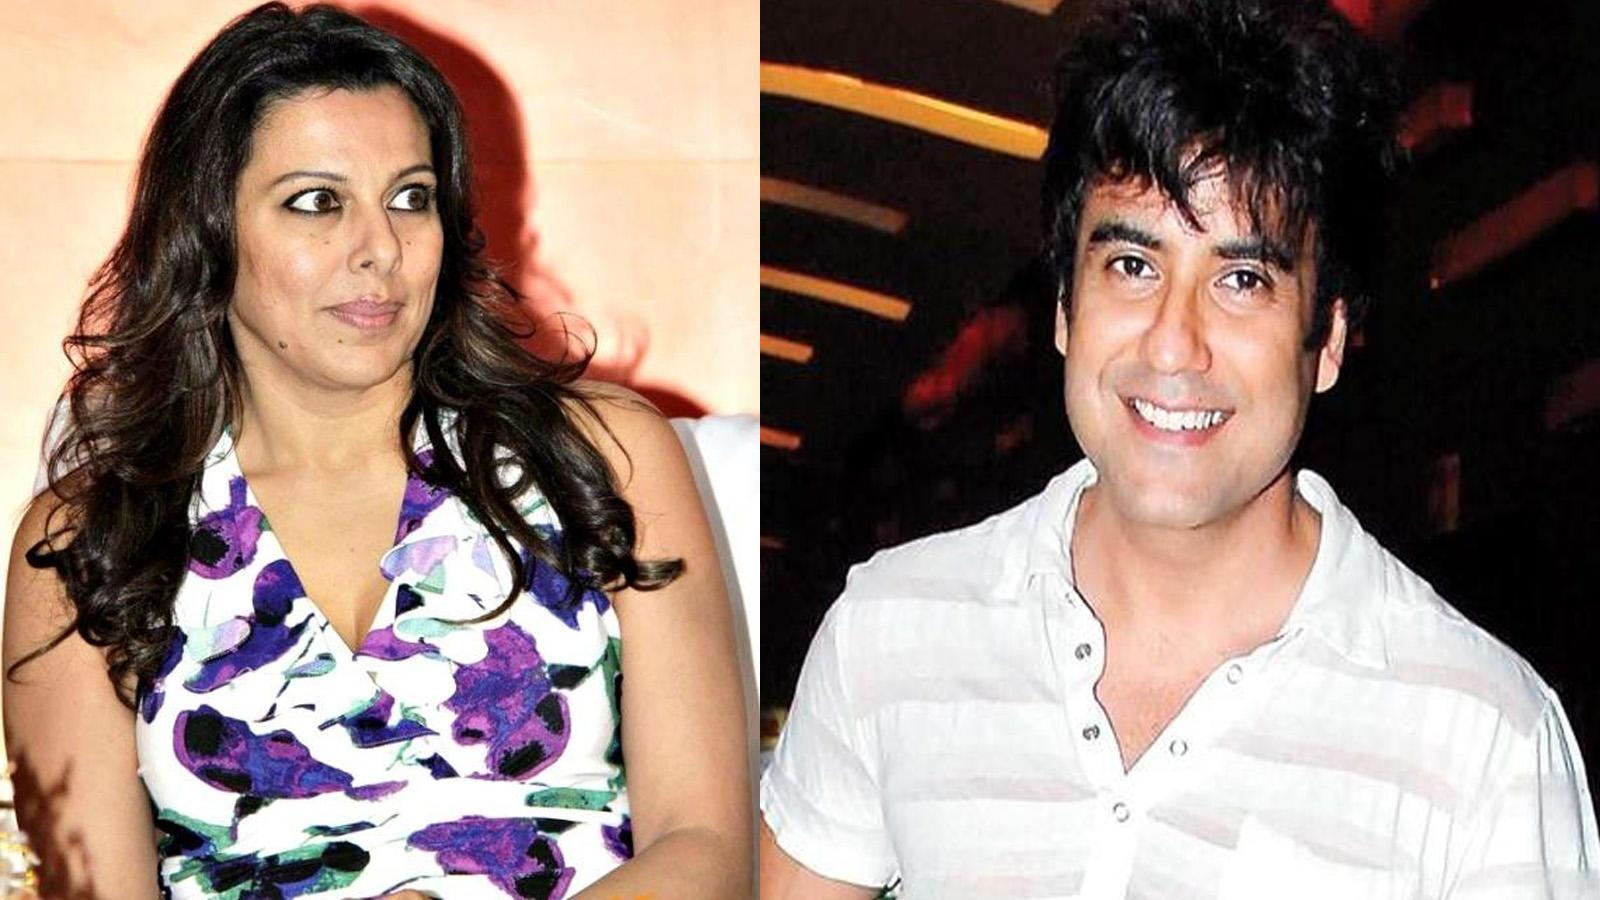 Pooja Bedi defends rape accused actor Karan Oberoi, says many women misuse law for vendetta